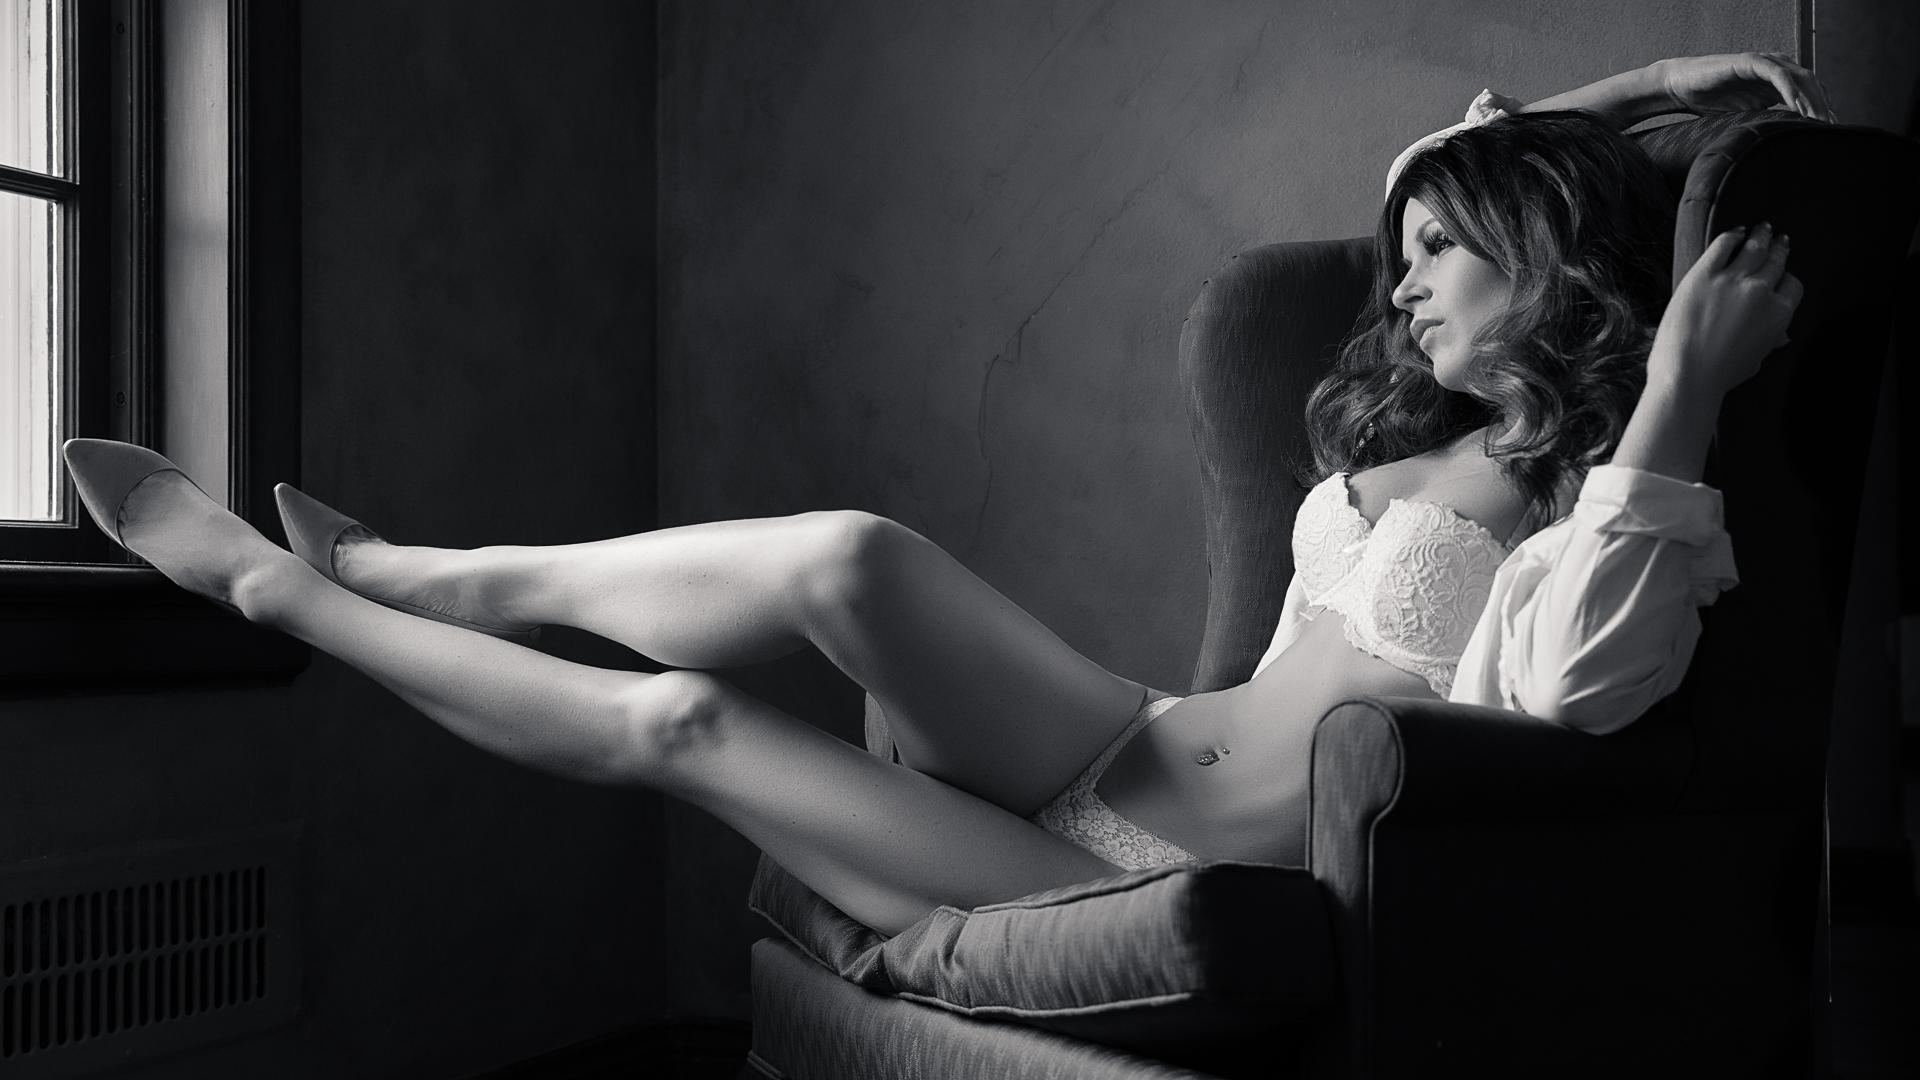 Model: Charlie Kristine @charliekristine Photo by: Jason Hahn @jason.trailblaze